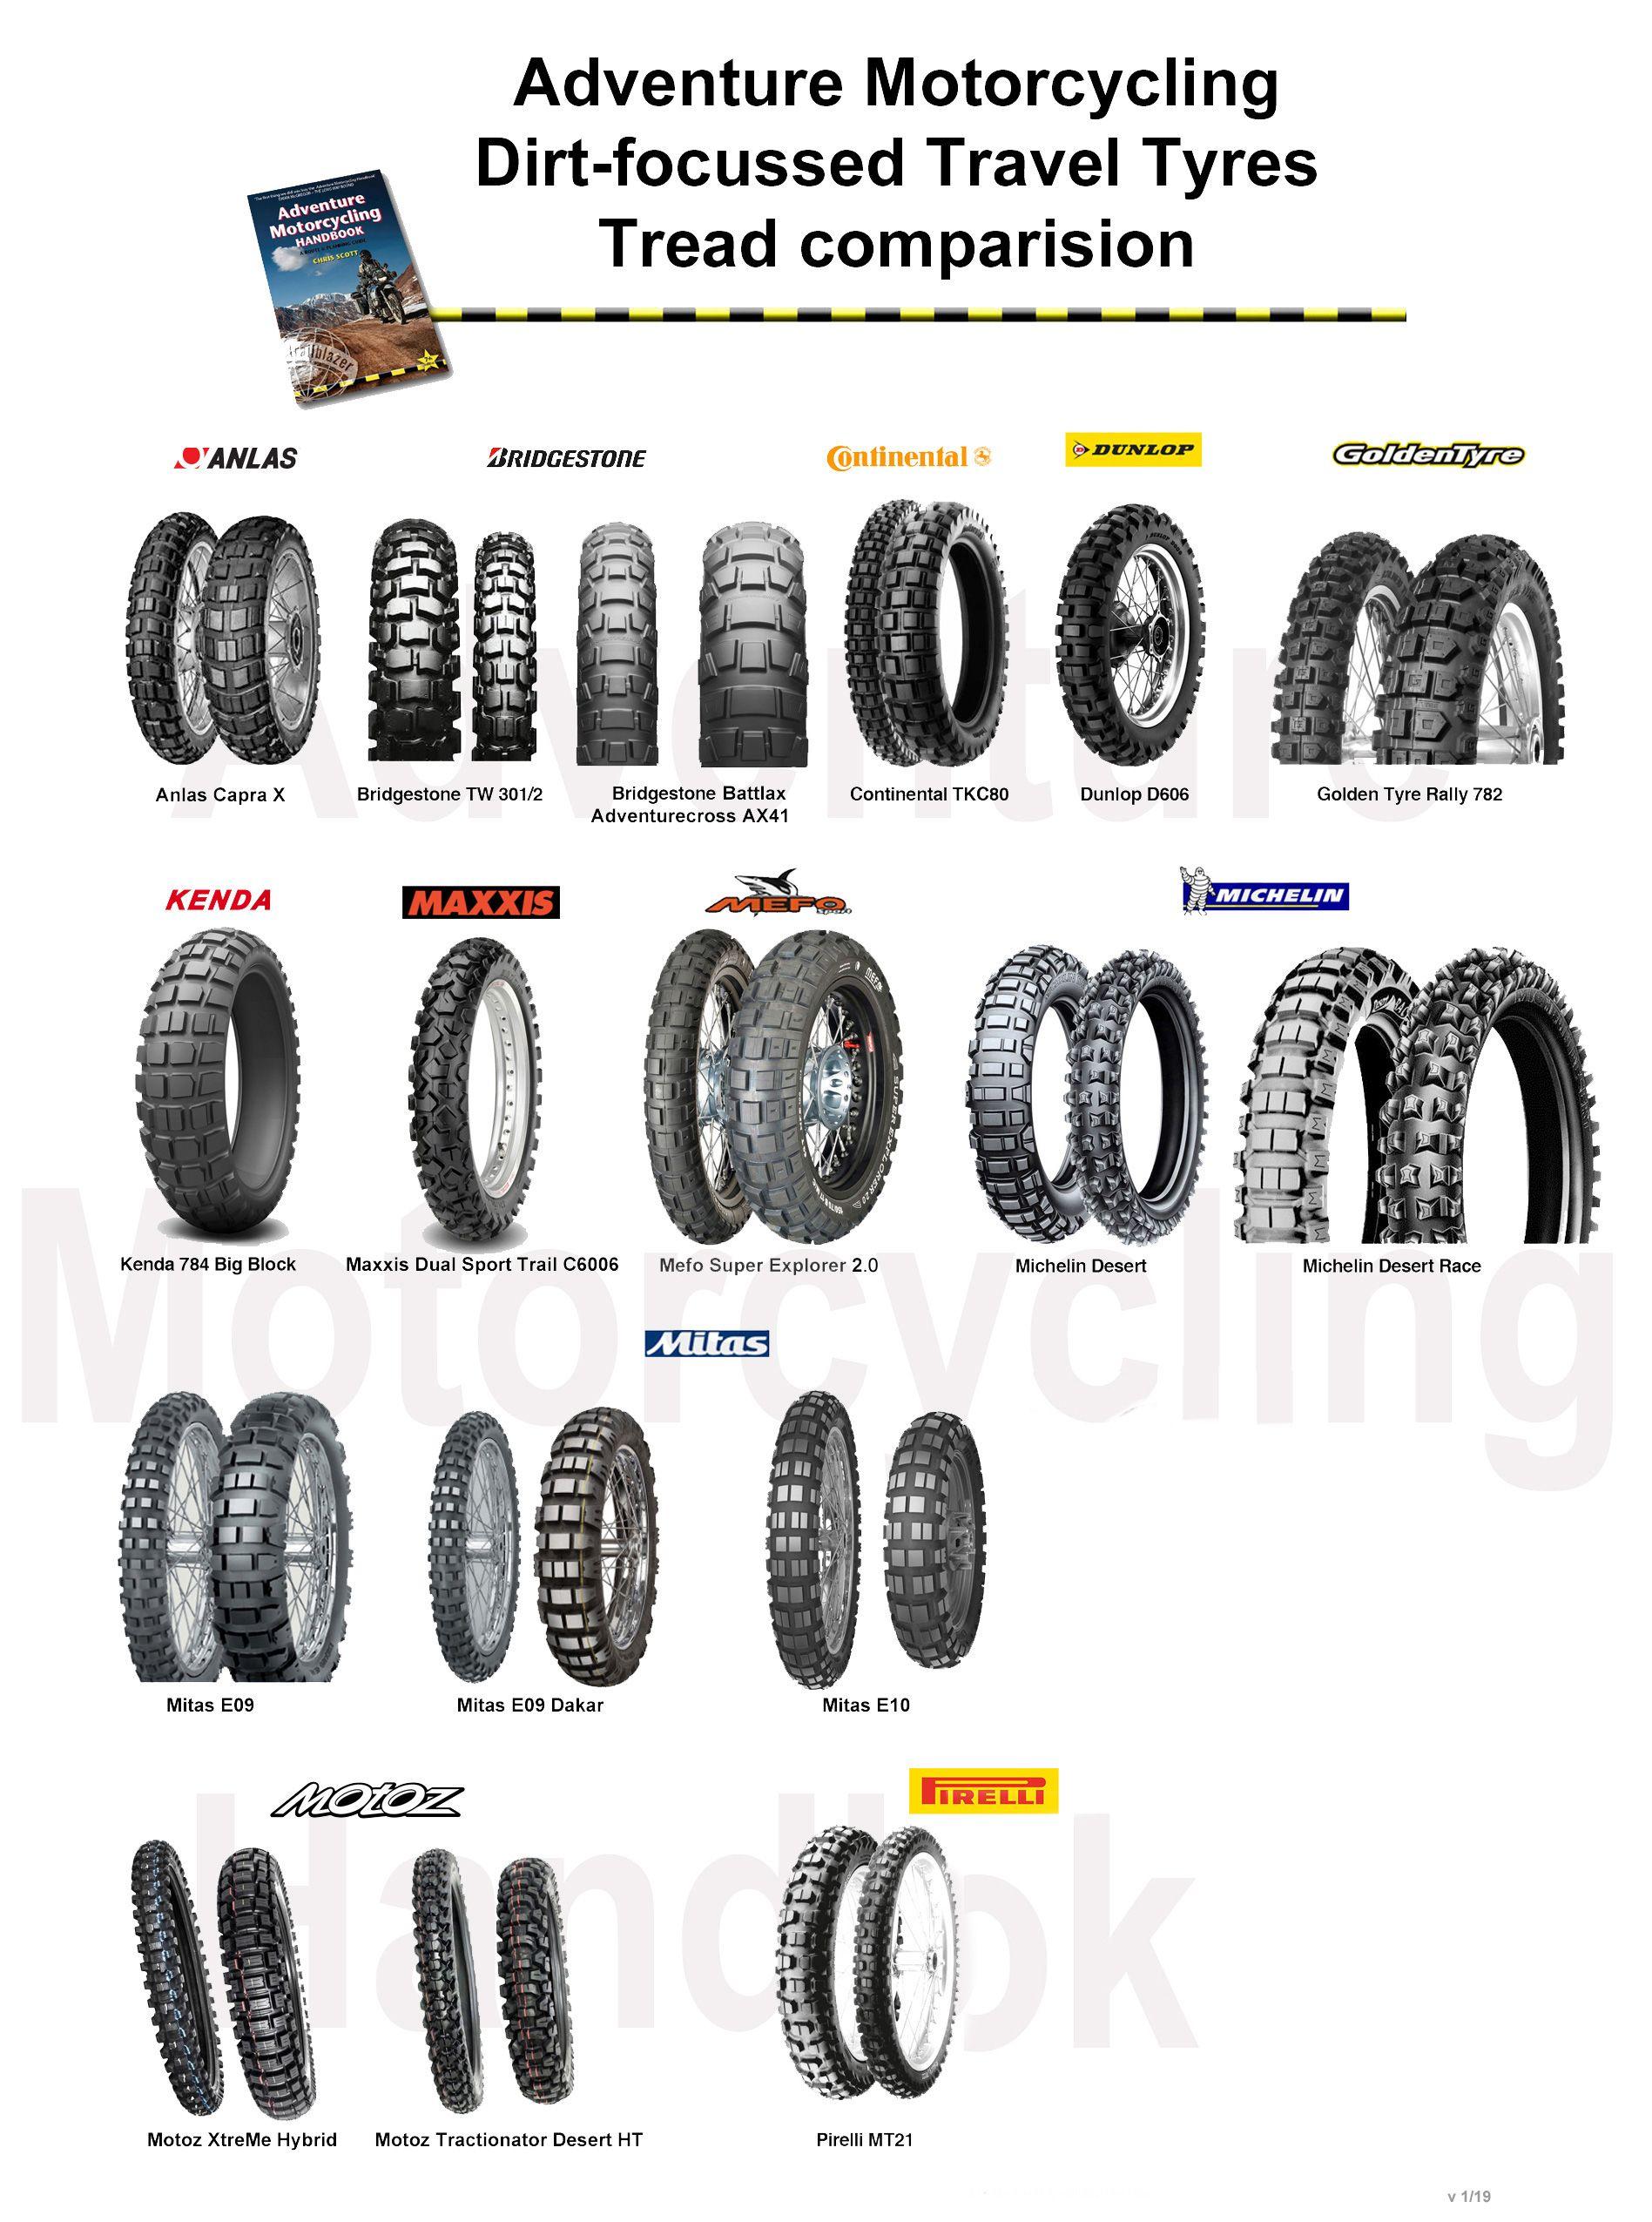 The Best Off Road Travel Tyres Adventure Motorcycling Handbook 2020 In 2020 Adventure Motorcycling Off Road Racing Bridgestone